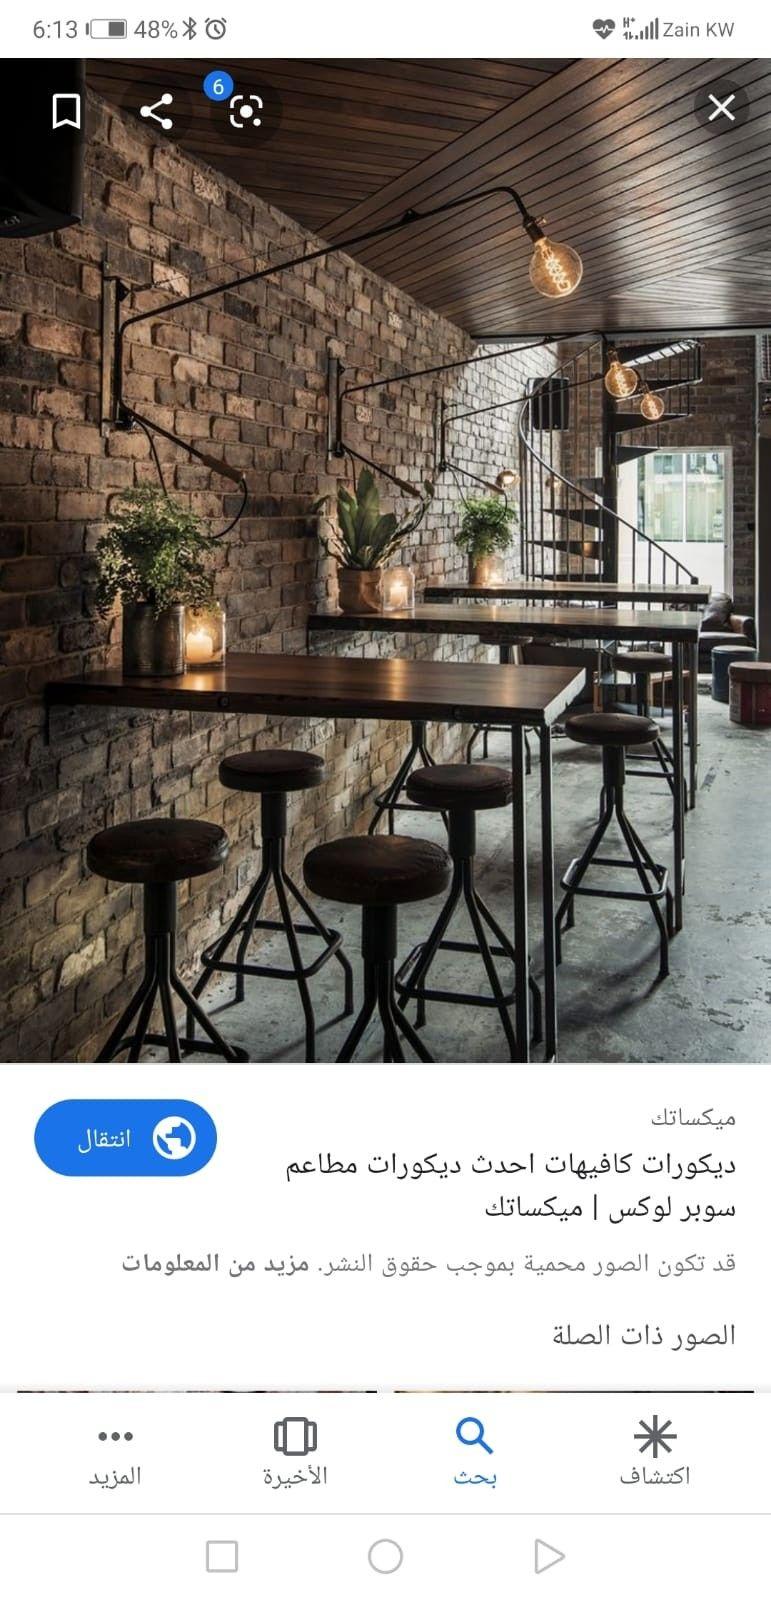 Pin By ابراهيم البحراوي On مراكش للديكور٦٠٠٠٩١٨٠ Coffee Shops Interior Shop Interiors Bar Table